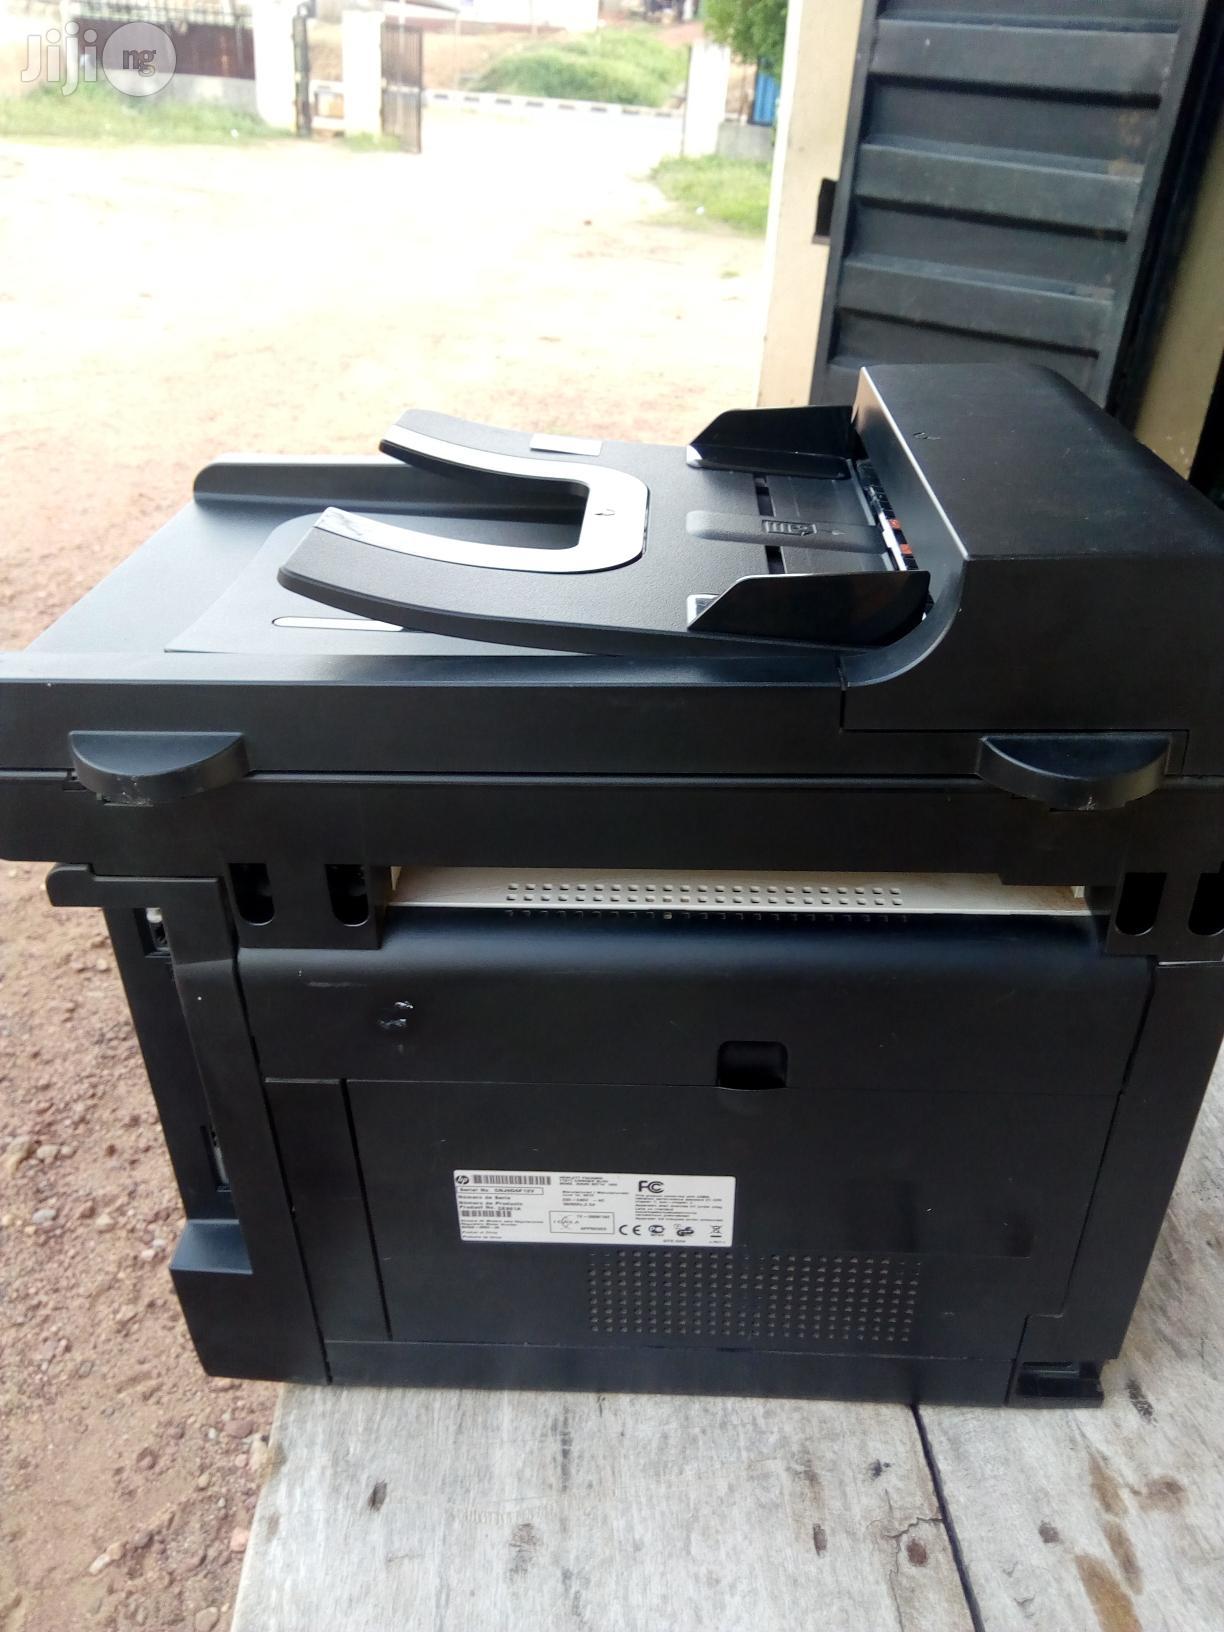 Colour Laserjet CM1415 MFP In Good Condition   Printers & Scanners for sale in Ado Ekiti, Ekiti State, Nigeria